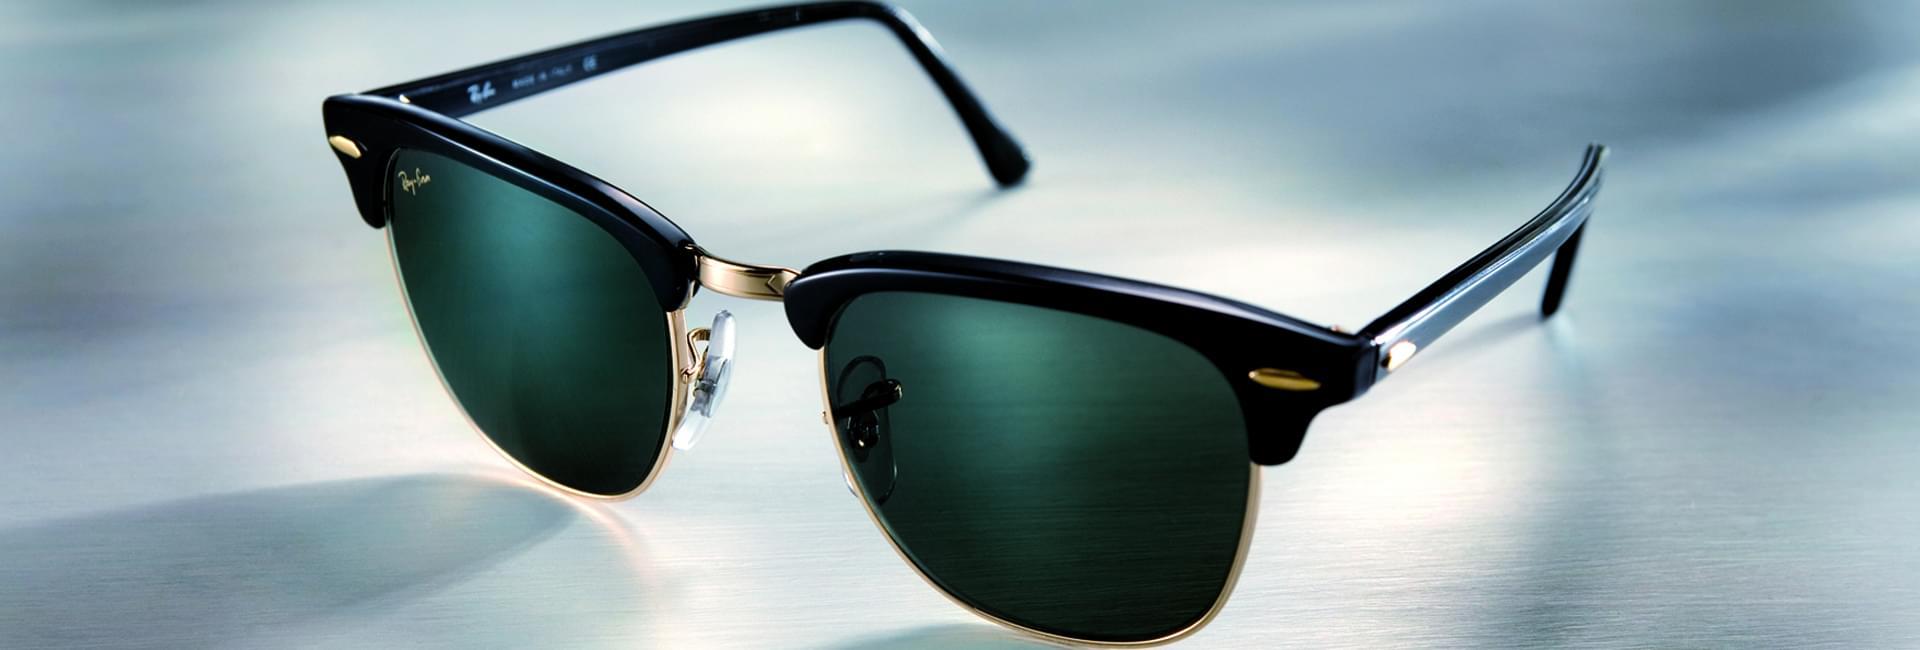 latest ray ban sunglasses models